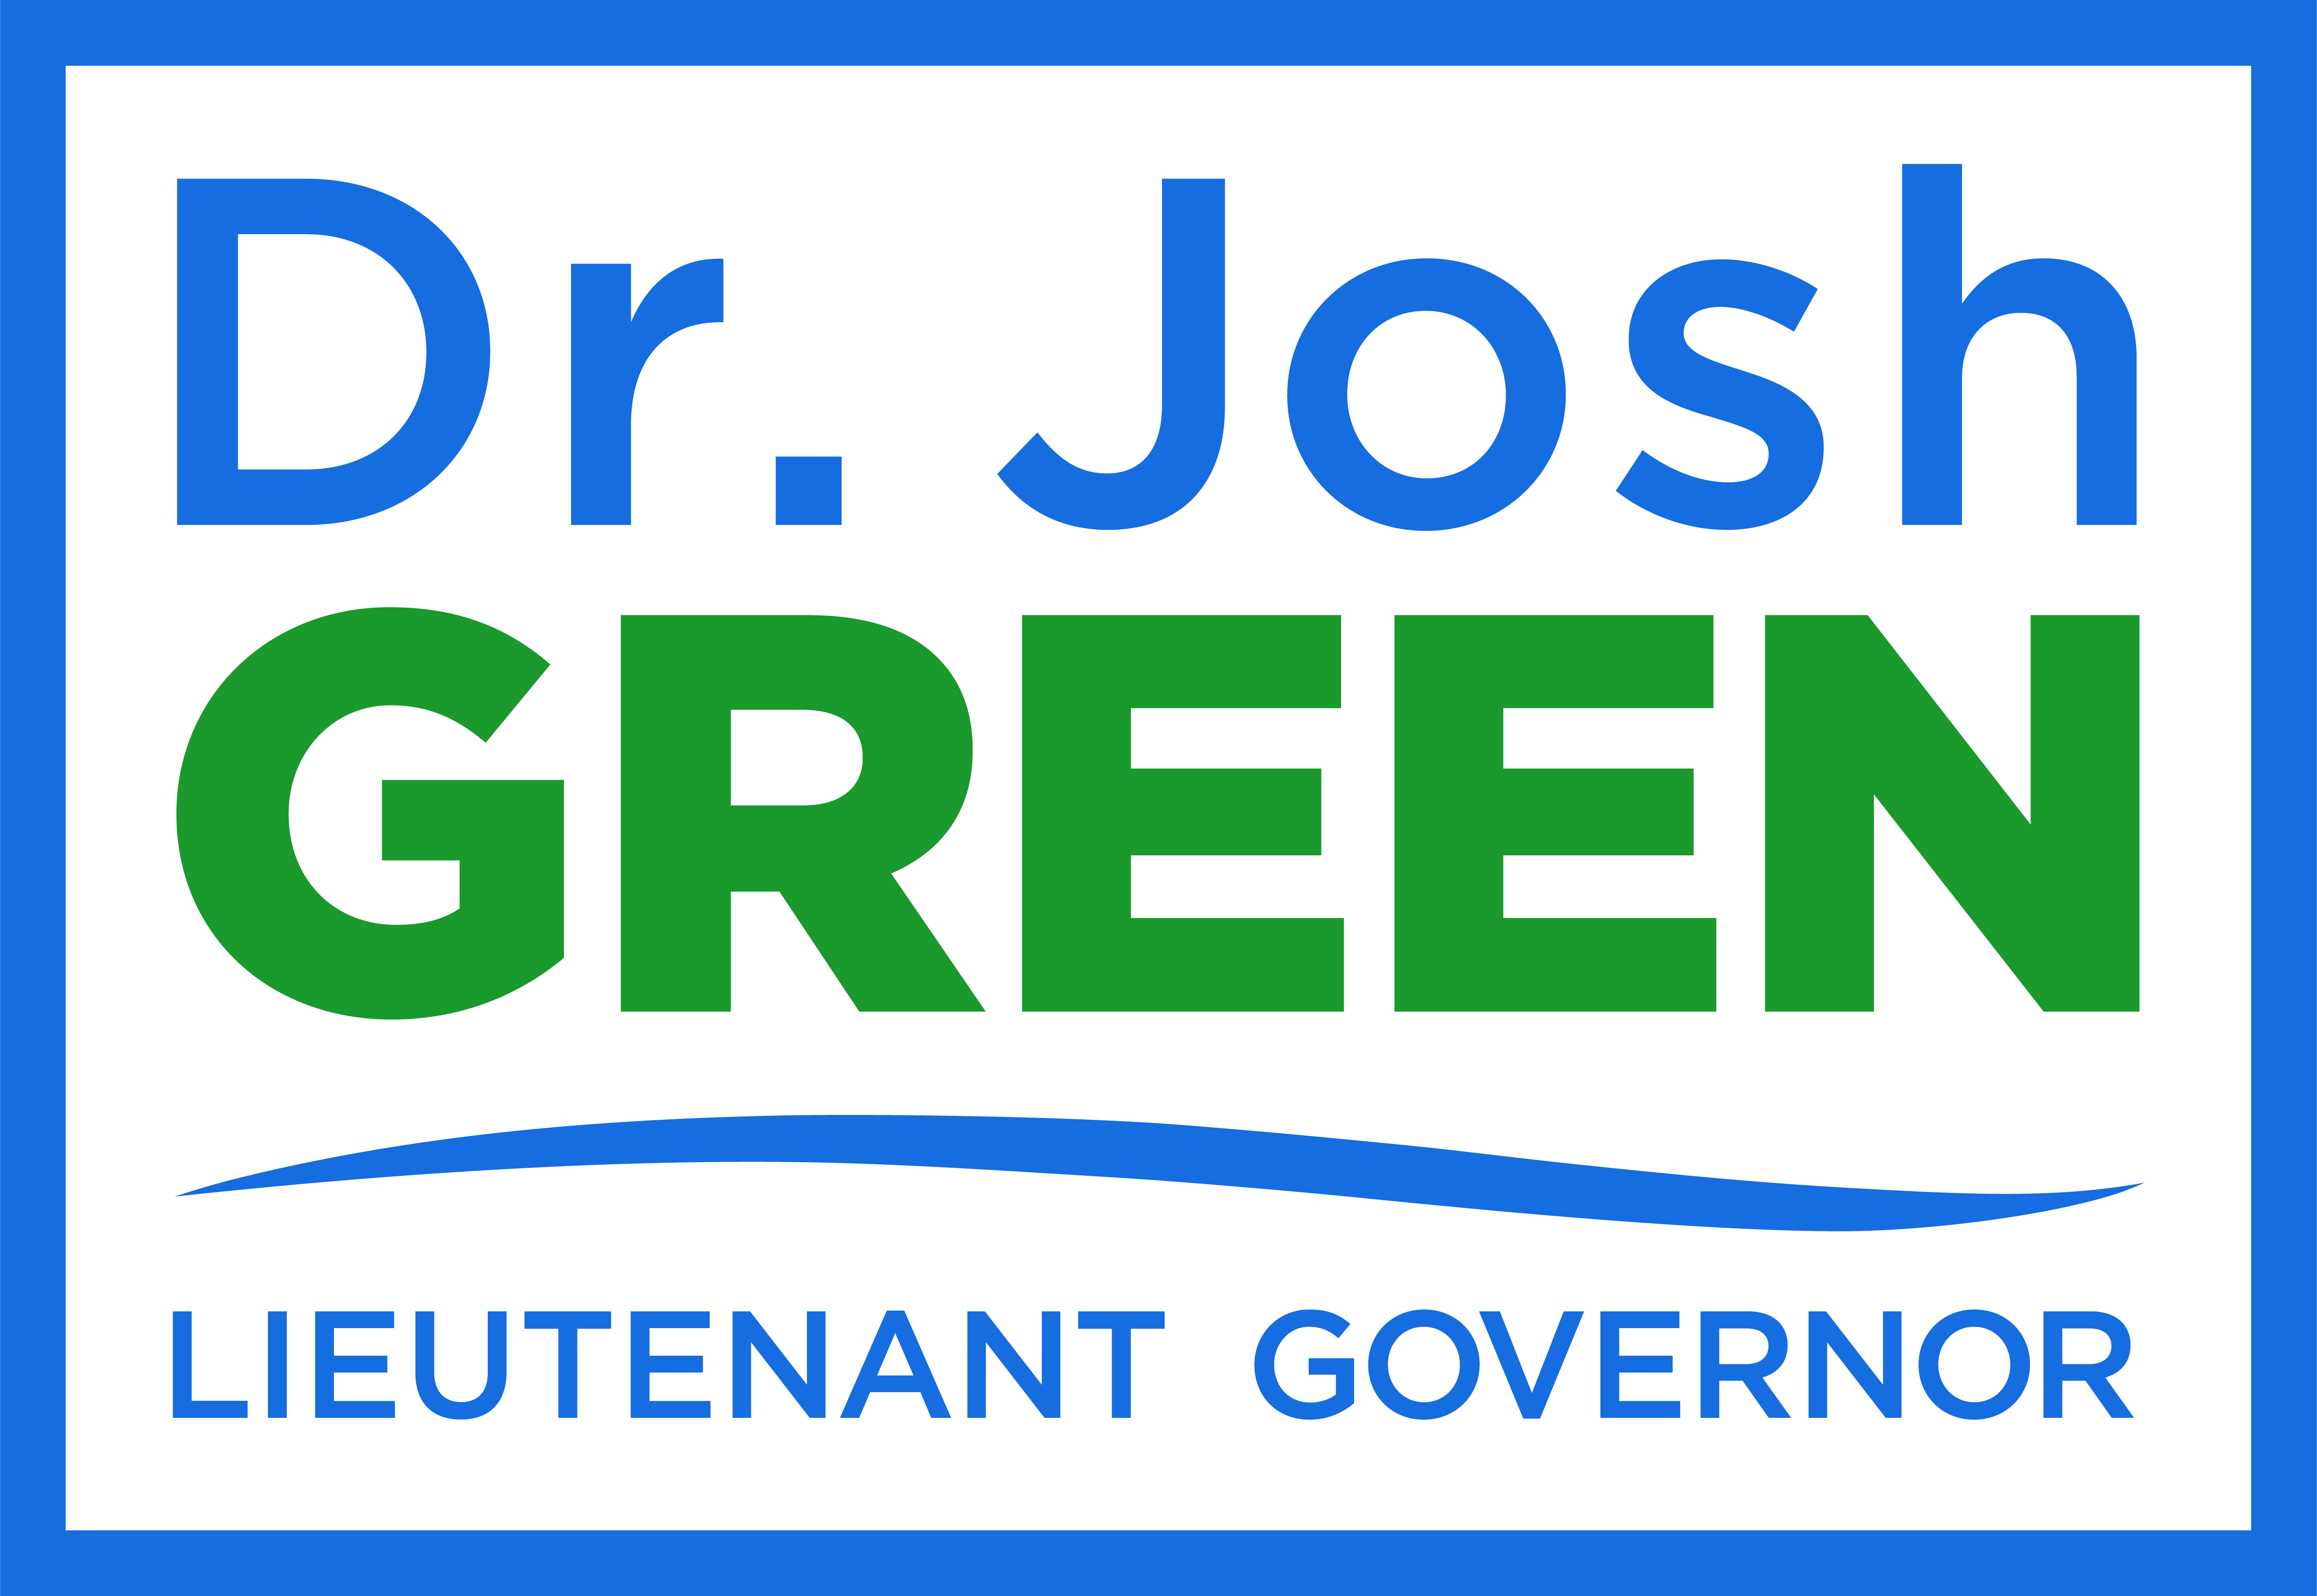 Josh Green